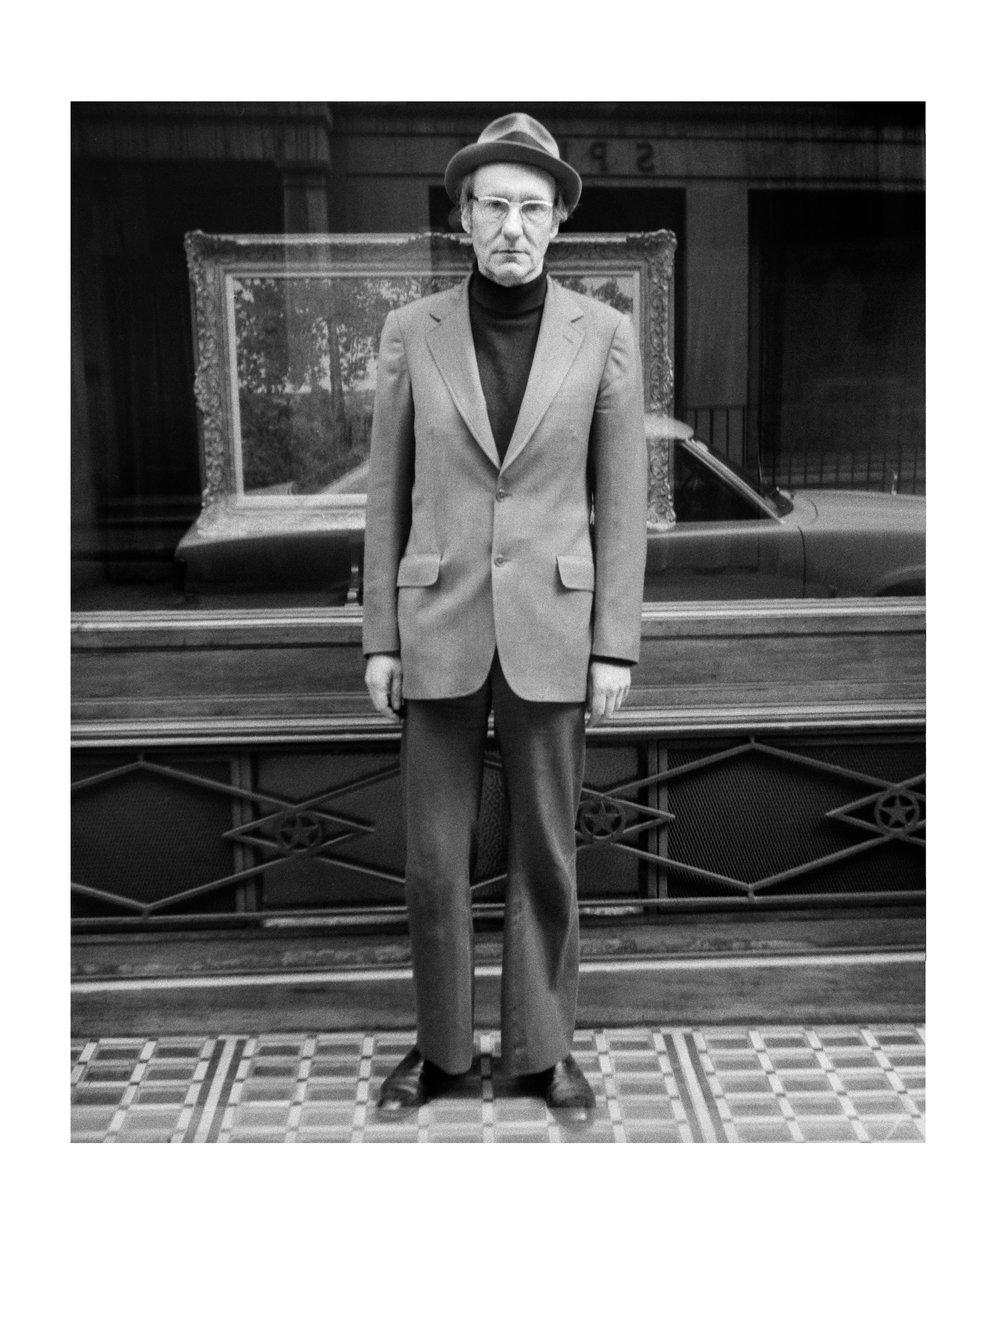 Burroughs standing 12x16.jpg